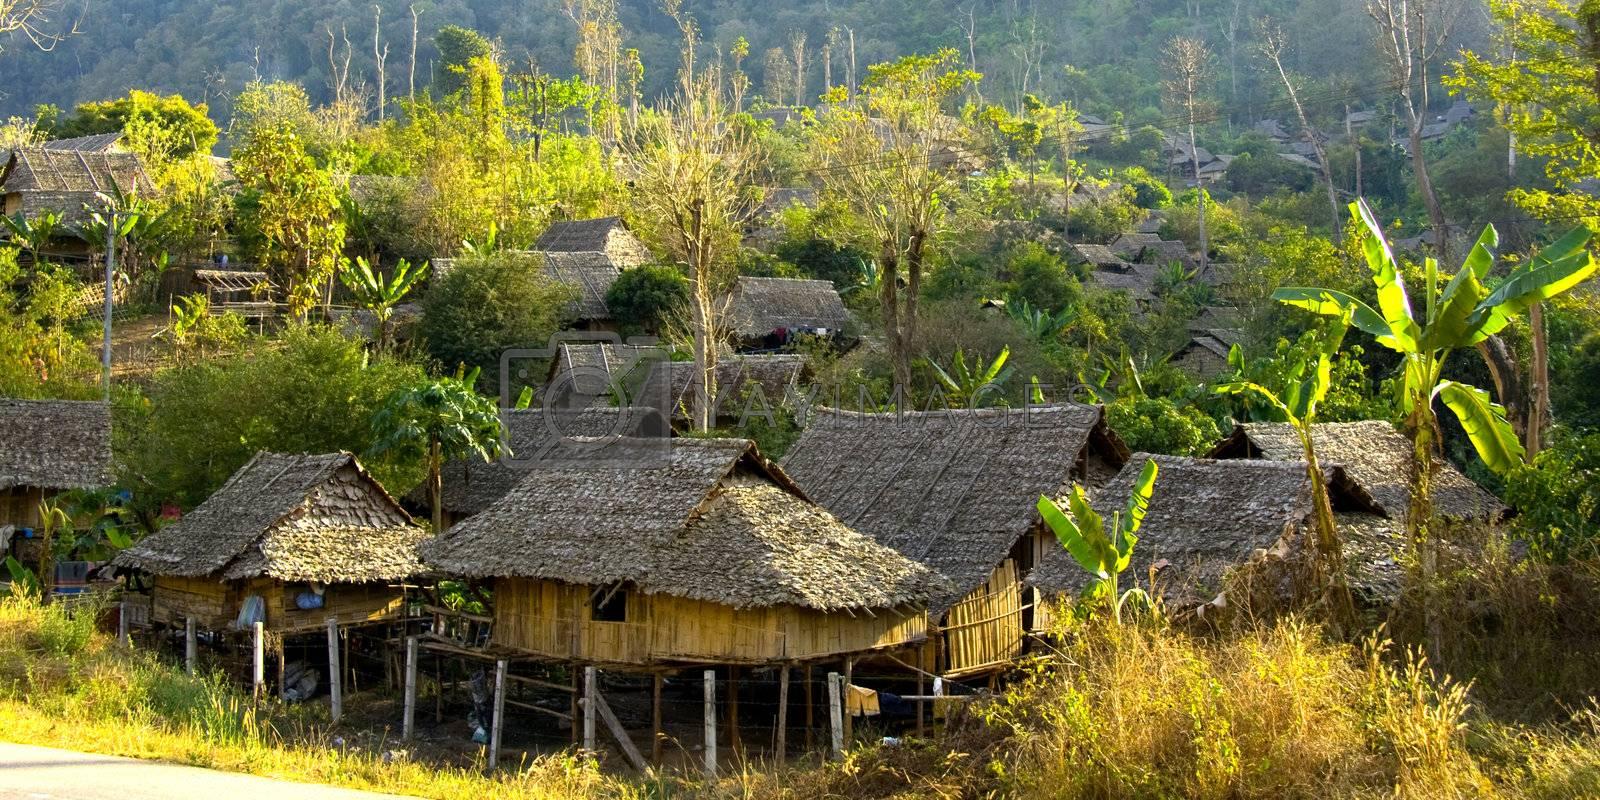 wooden jungle village set in the Thai-Burma border thailand